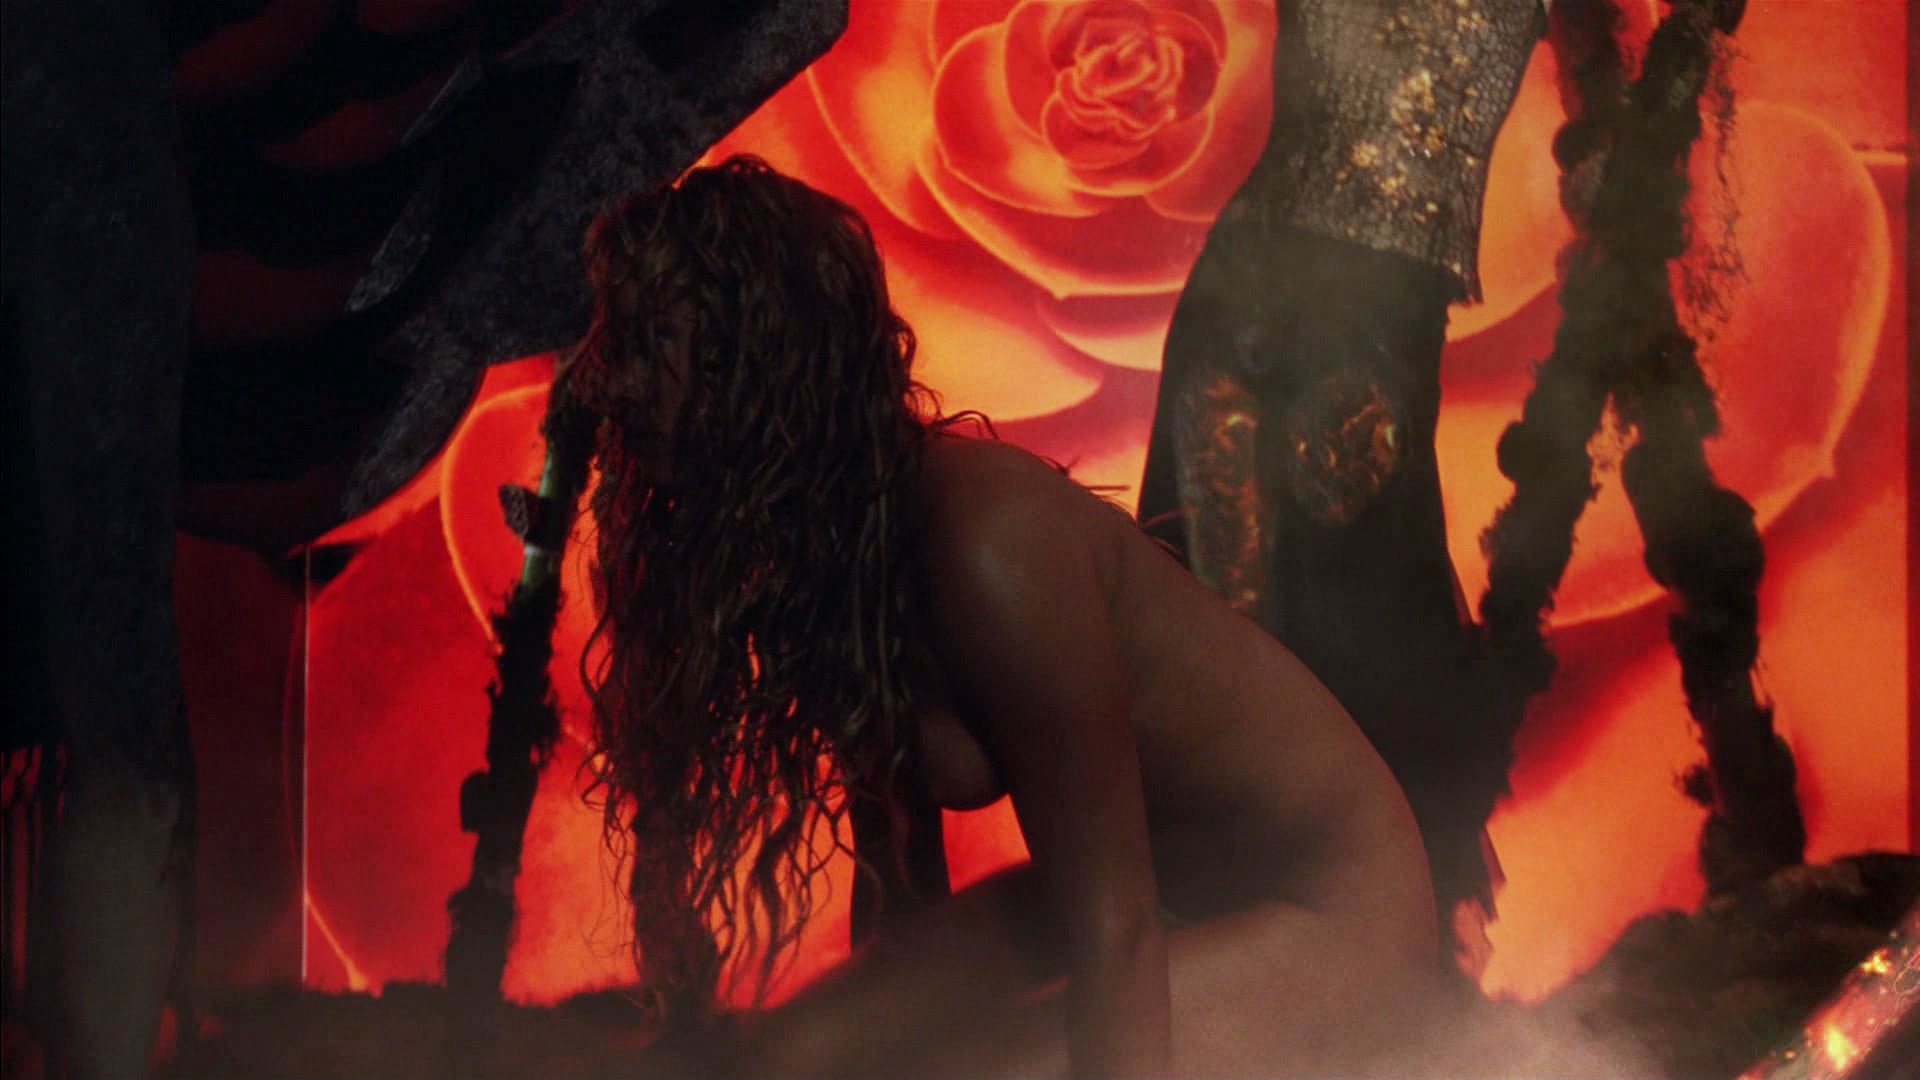 nudity in terminator movies